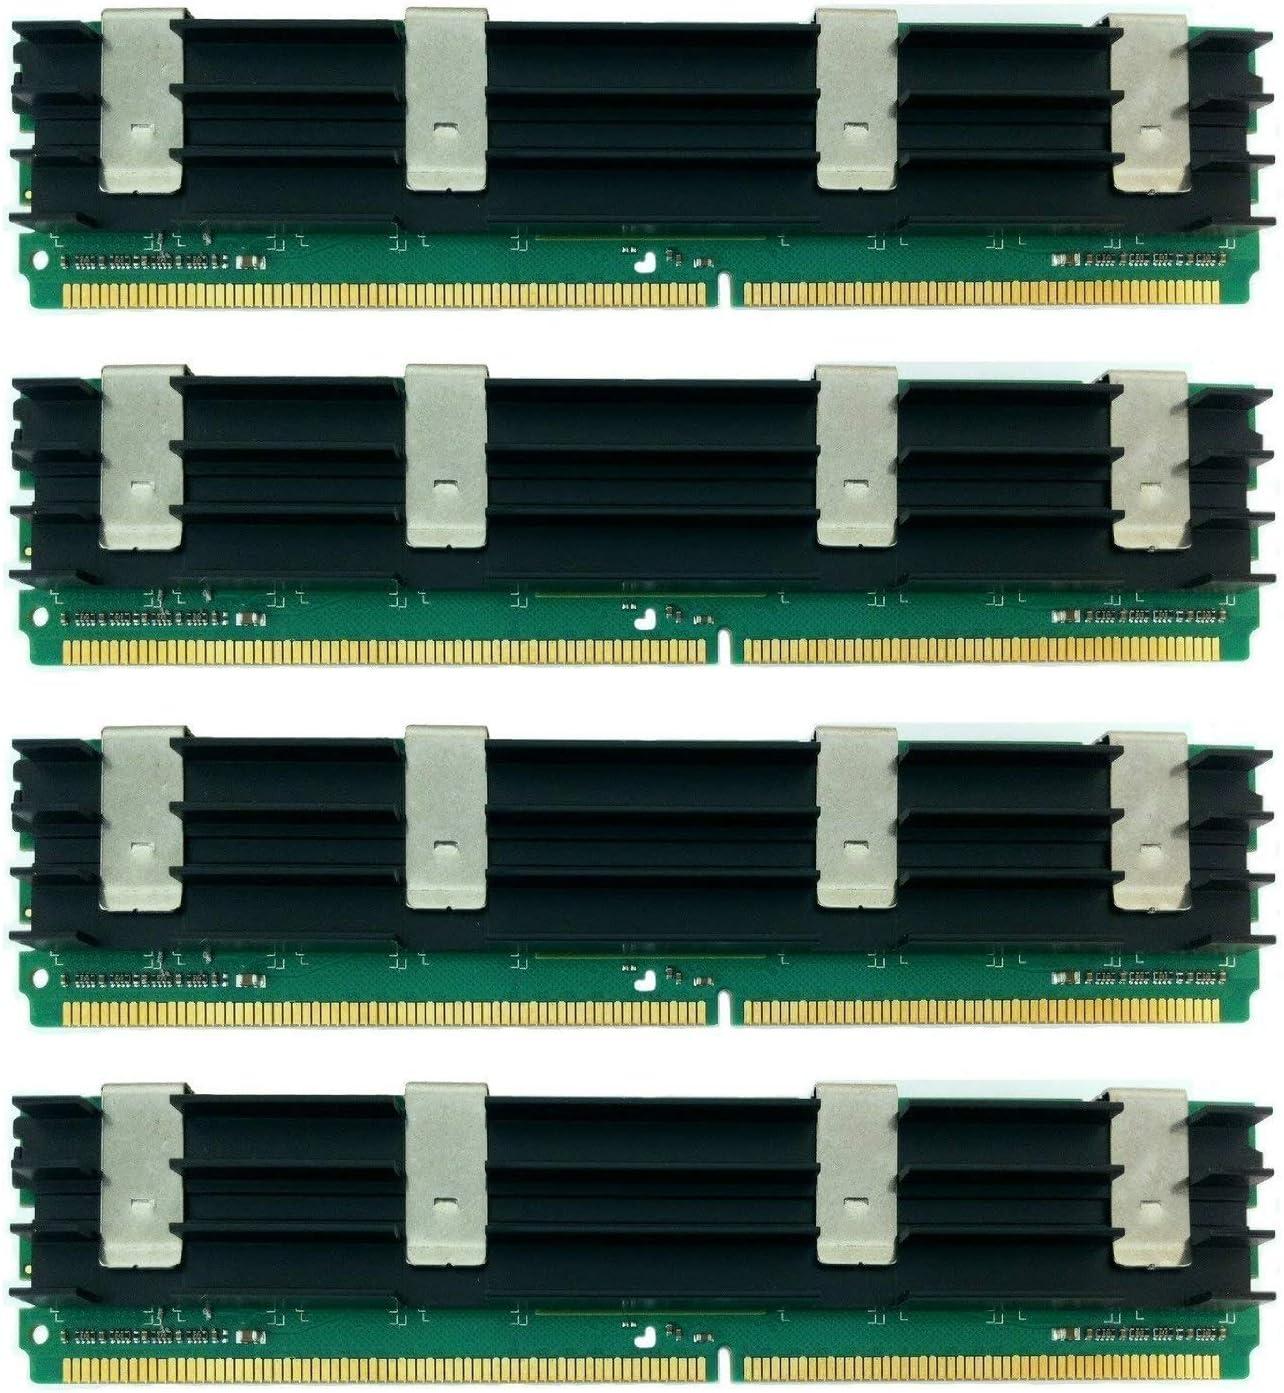 MemoryMasters 16GB DDR2-800 FB-DIMM Fully Buffered PC3-6400 DDR2 800Mhz ECC Kit for Apple Compatible Mac Pro - Model Id 3,1 - (4X 4GB)